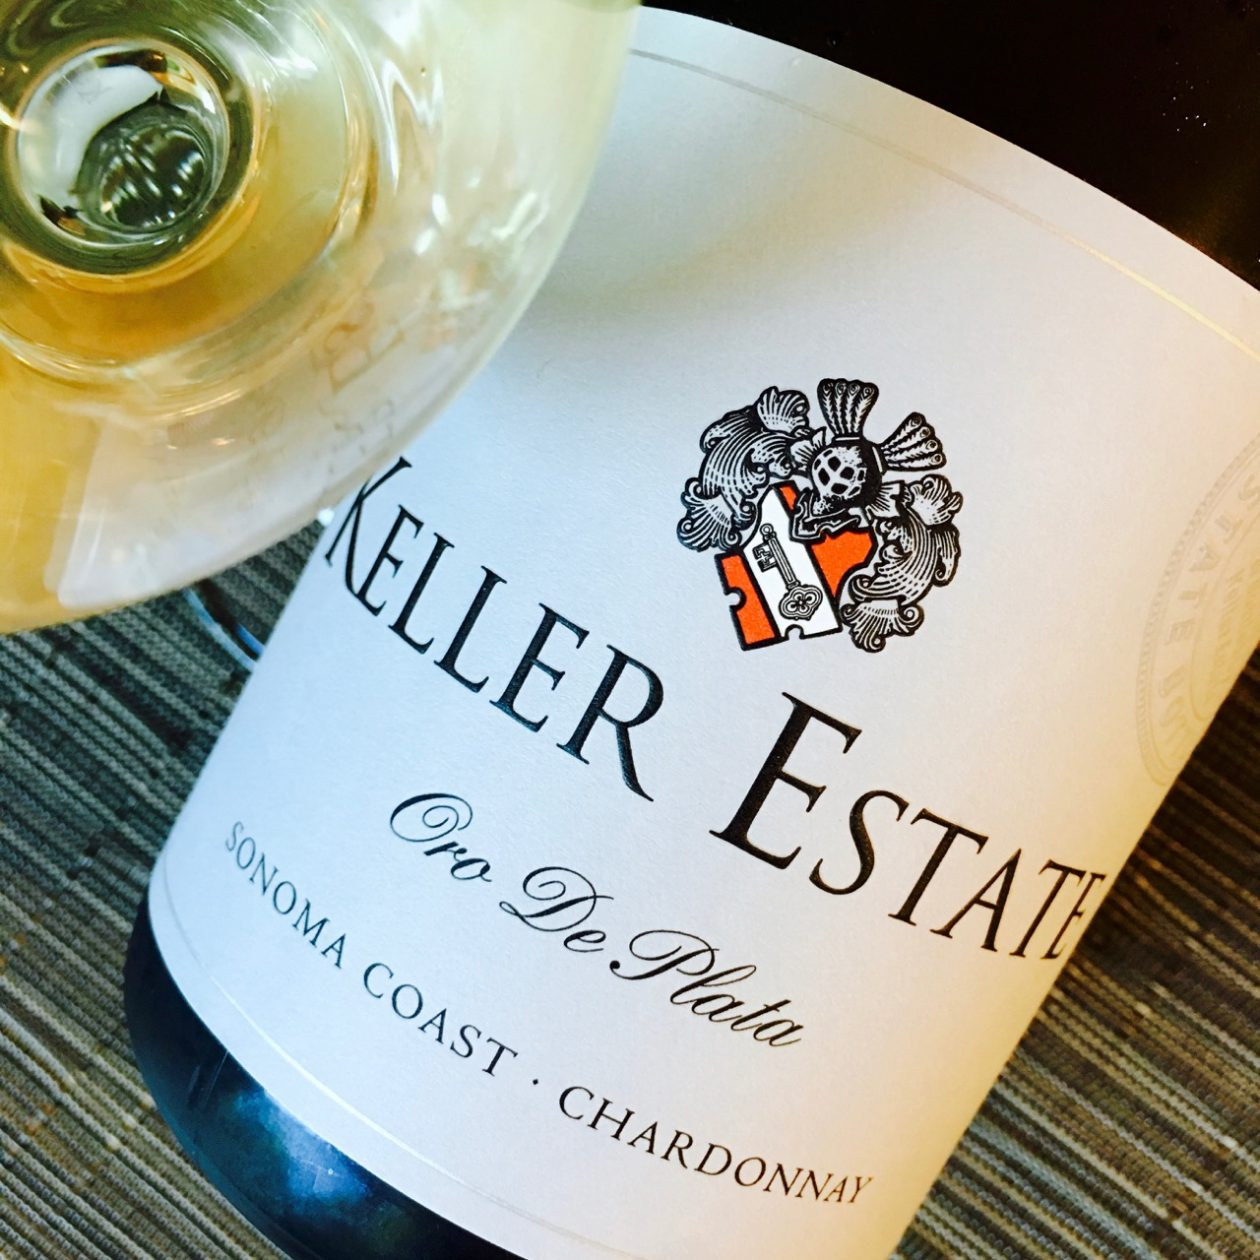 2013 Keller Estate Chardonnay Oro de Plata Sonoma Coast, Sonoma County